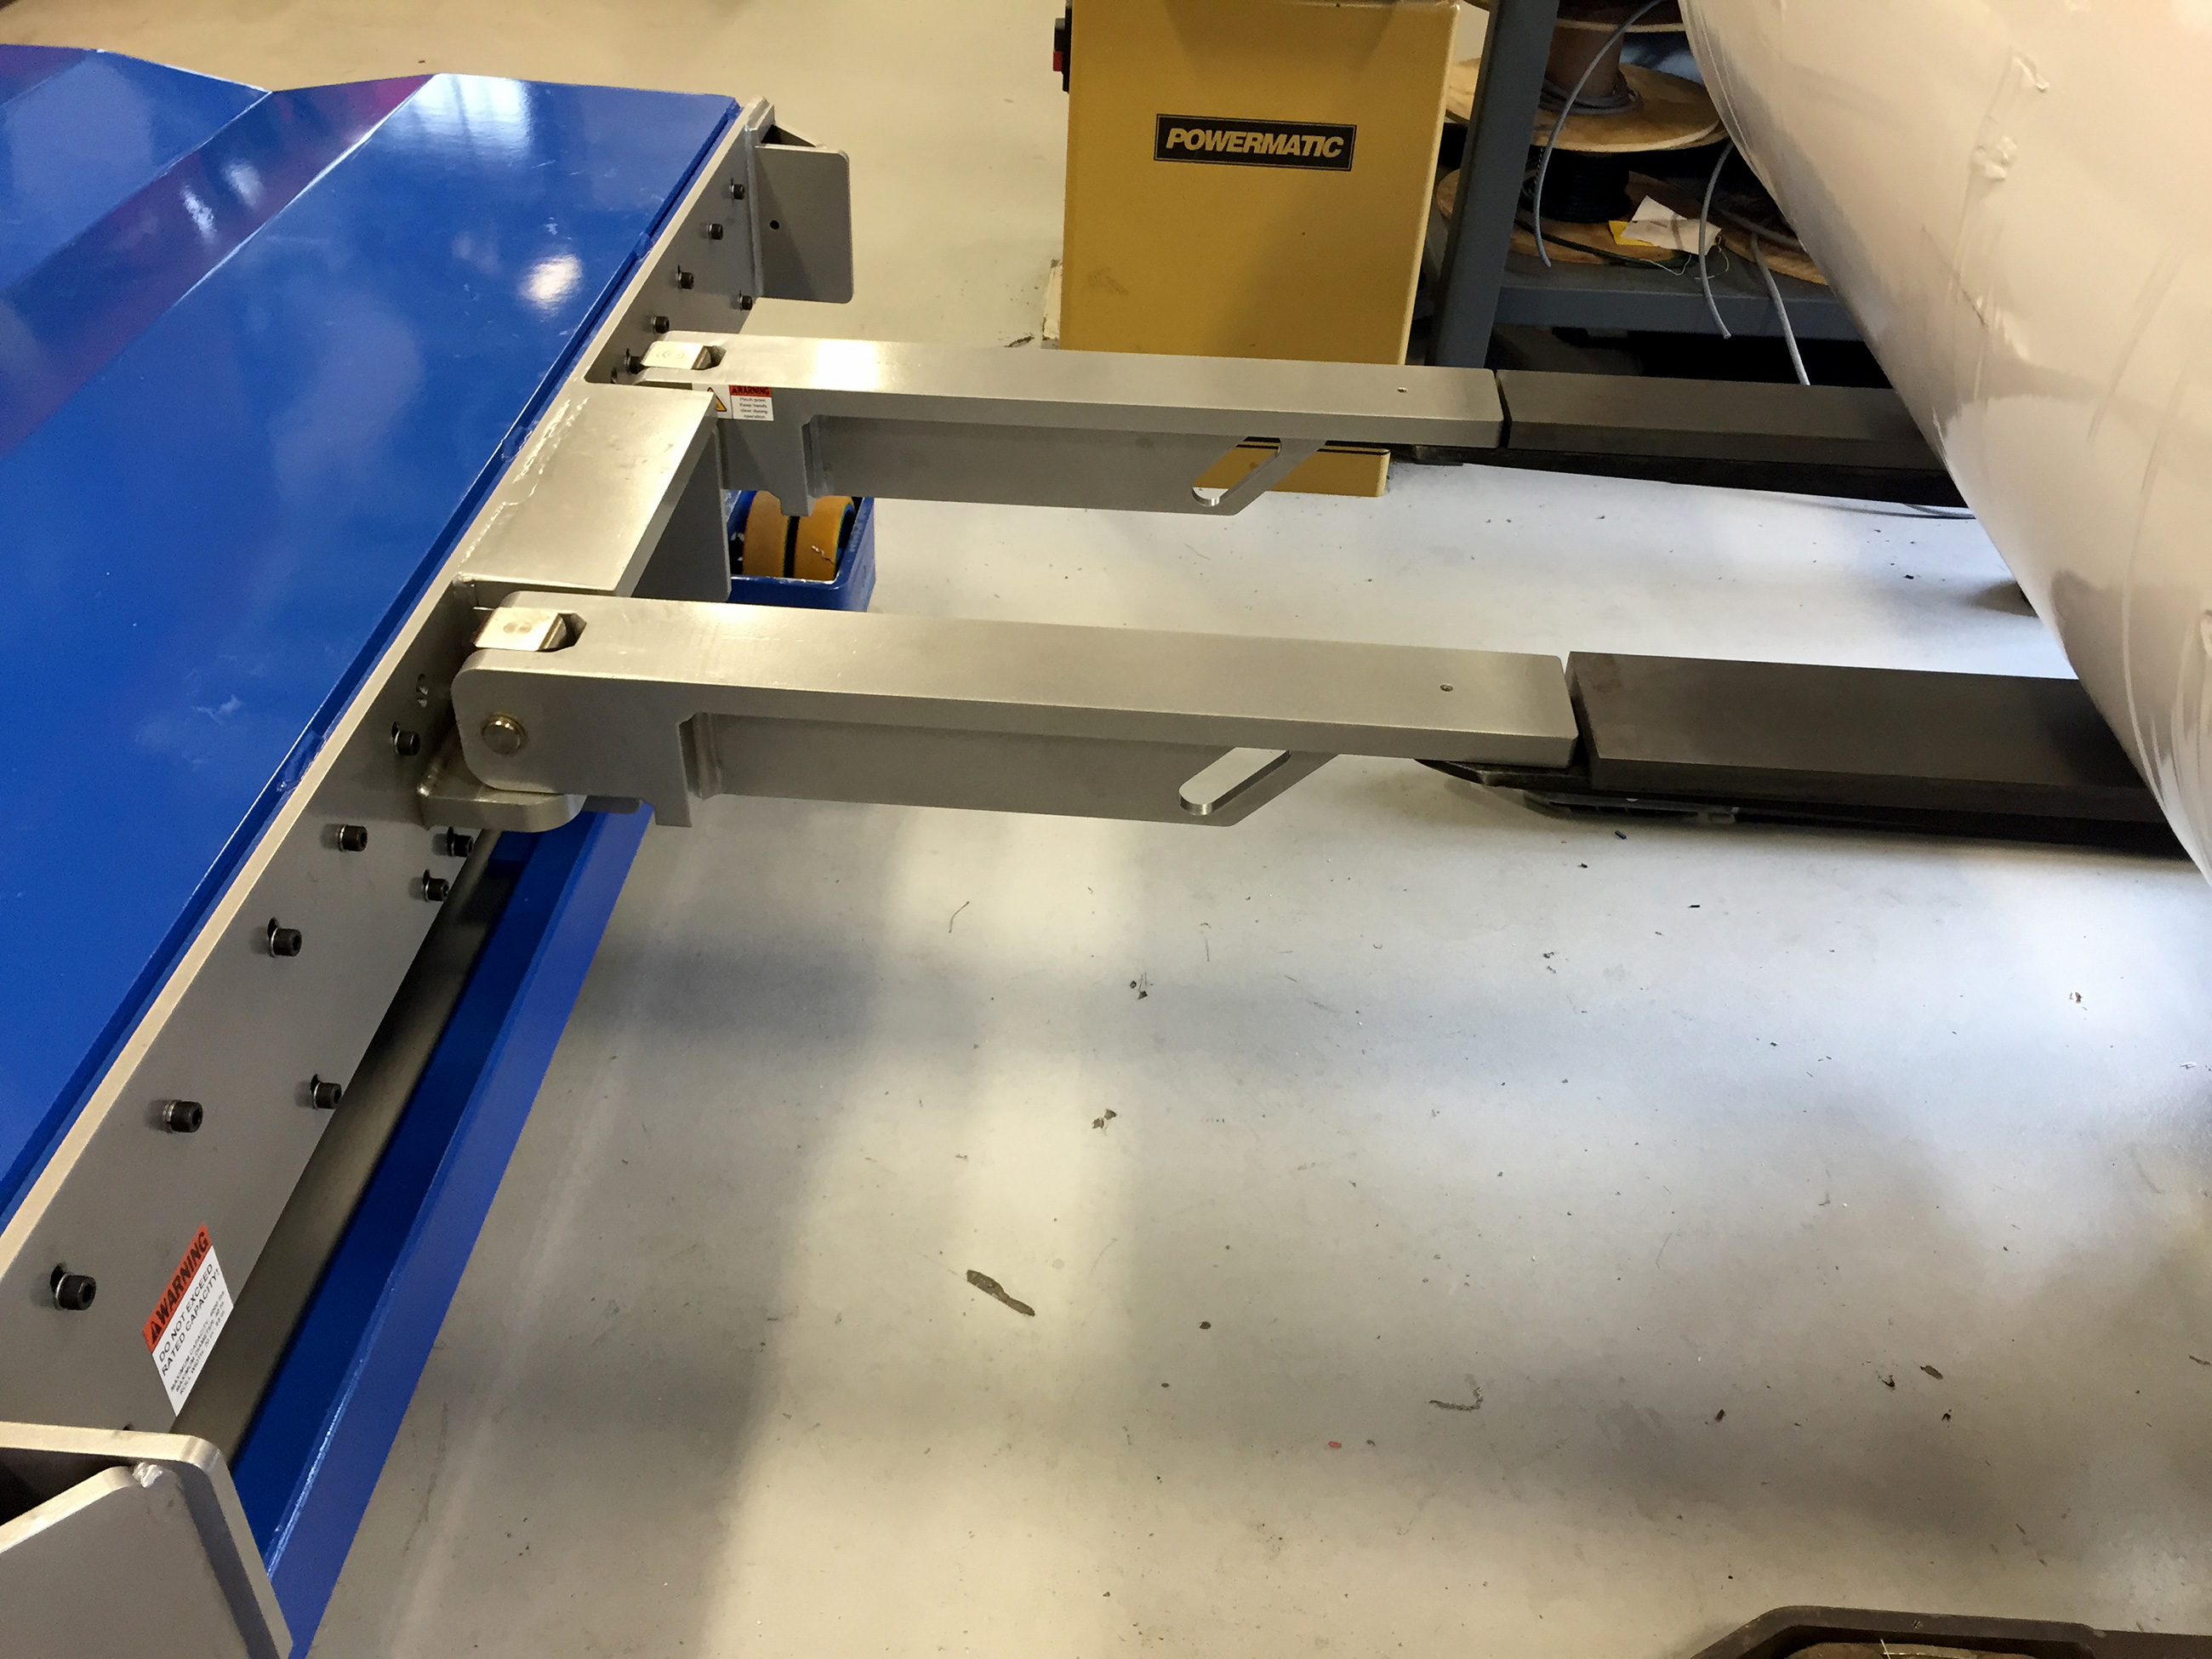 Portable Lift Table Paper Roll Handling Equipment